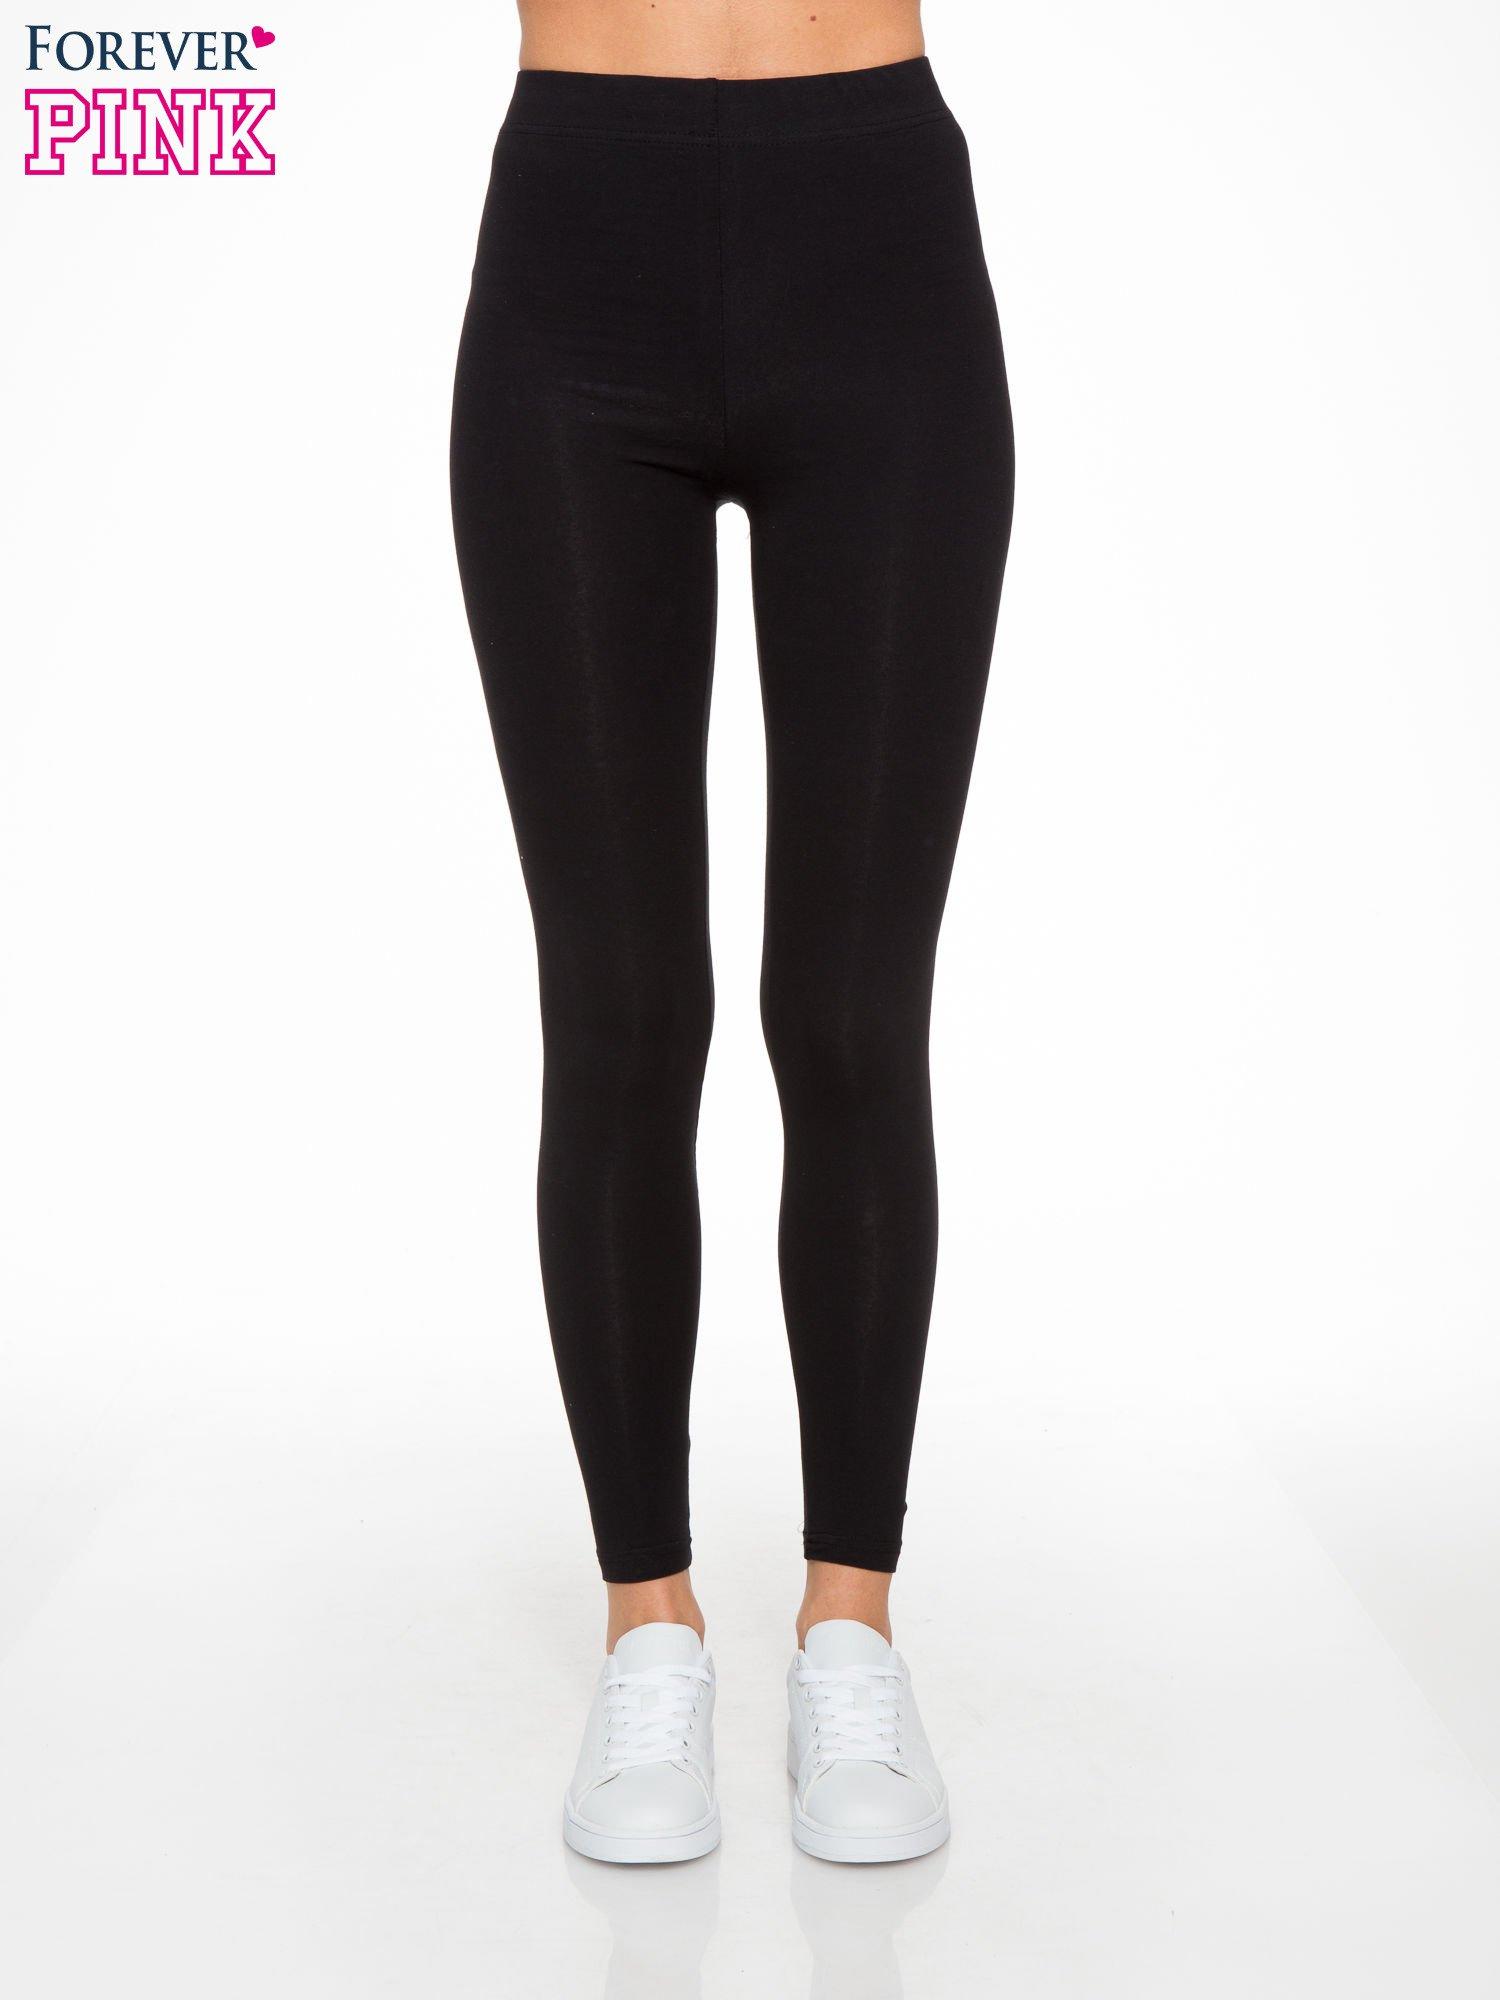 16a71e9420c6e4 Czarne elastyczne legginsy damskie z bawełny - Spodnie legginsy ...